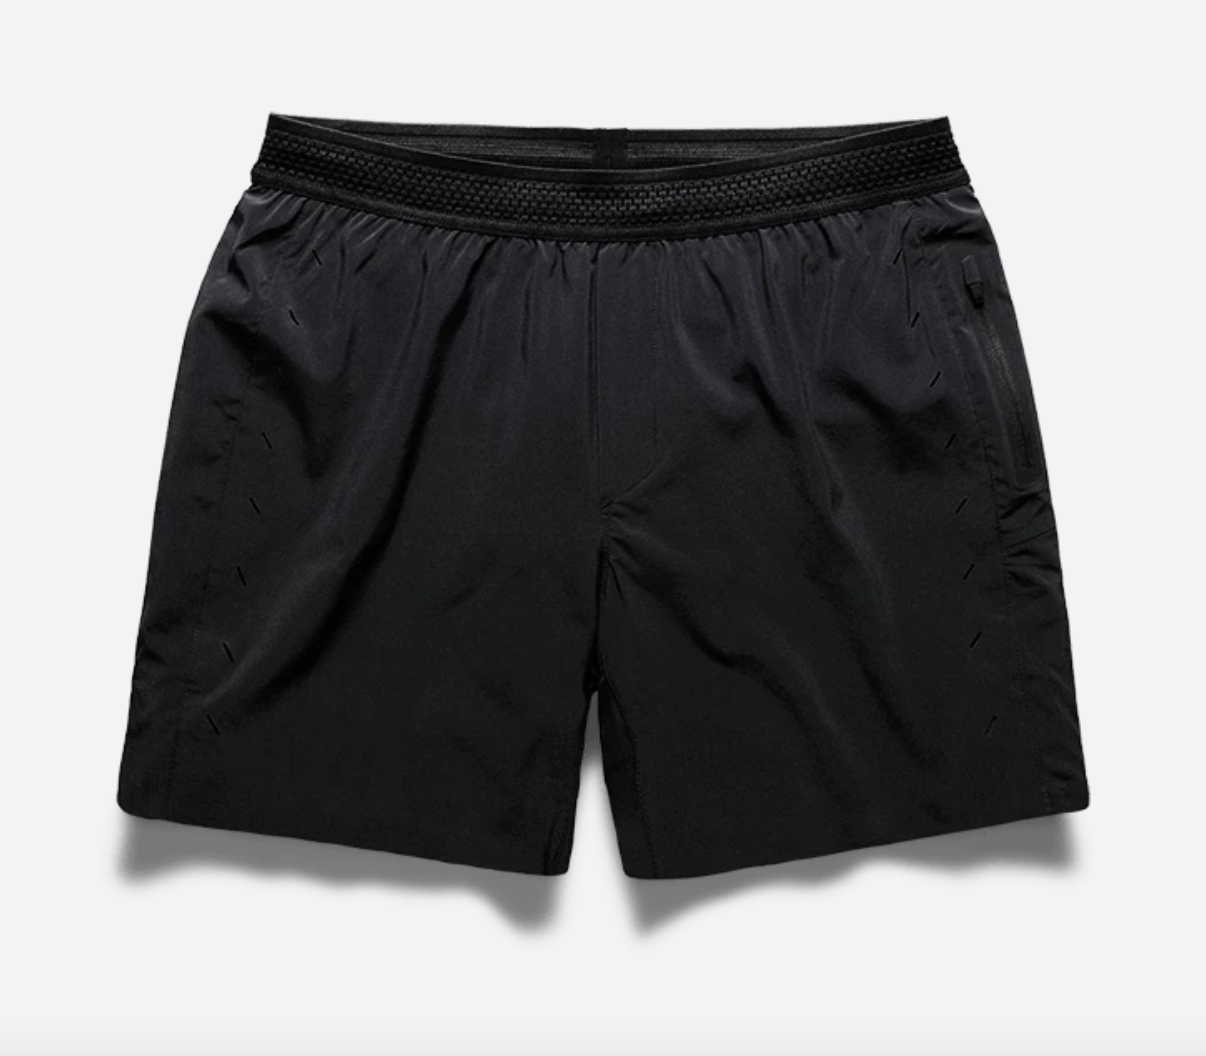 black short shorts mens